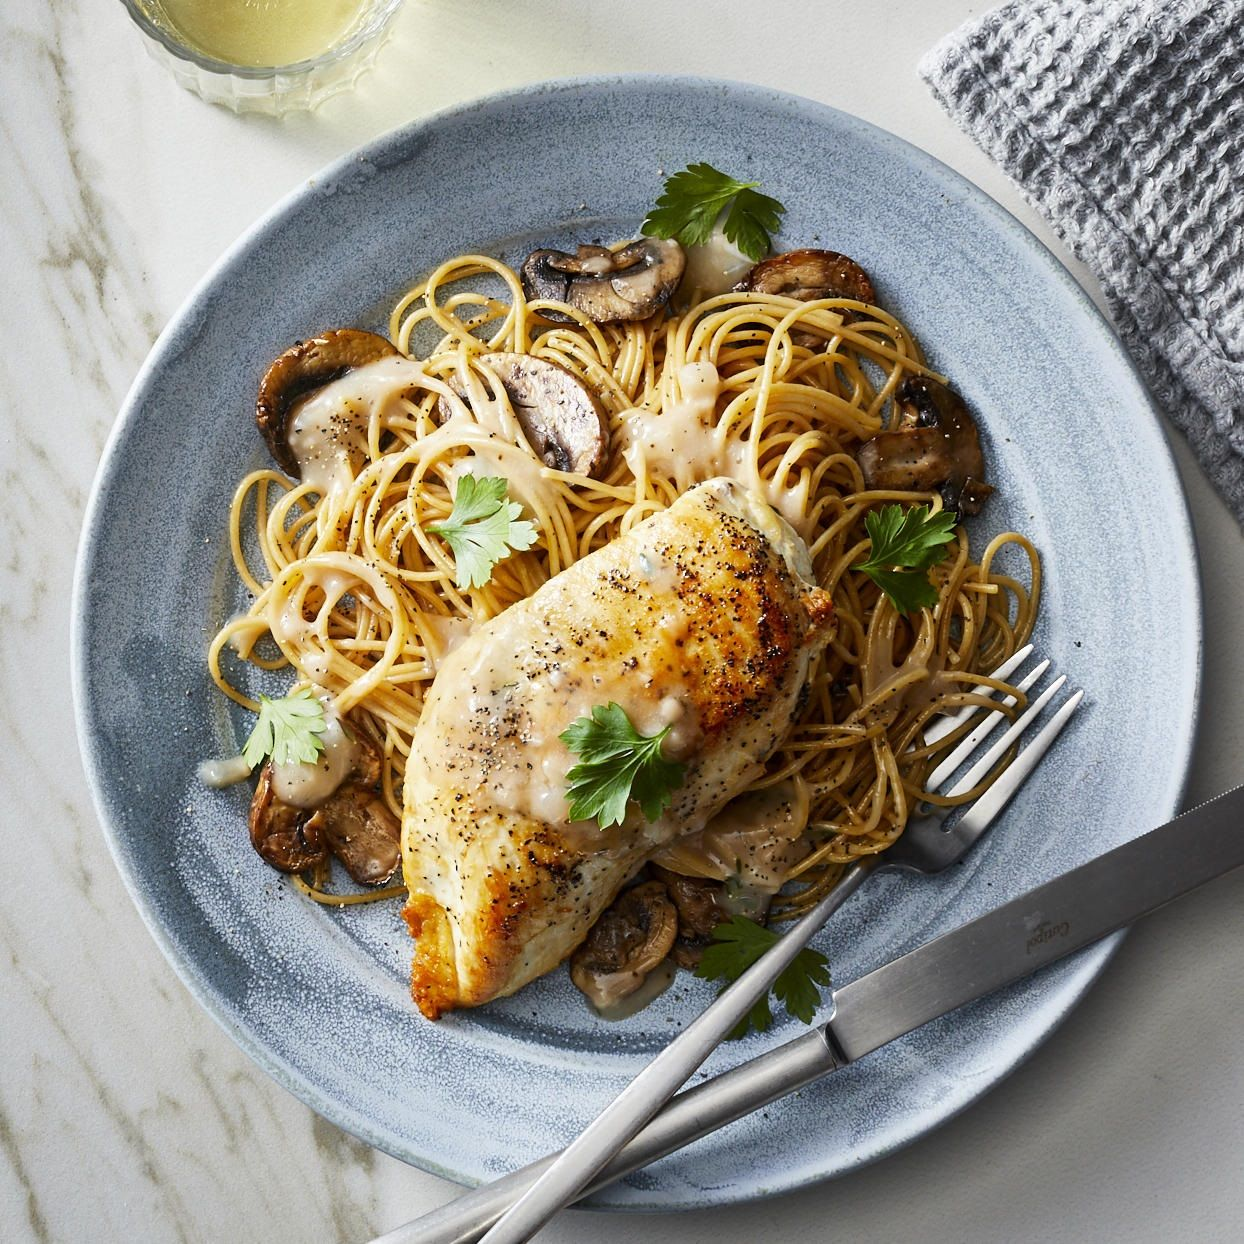 Slow Cooker Chicken Marsala Recipe In 2020 Slow Cooker Chicken Slow Cooker Chicken Marsala